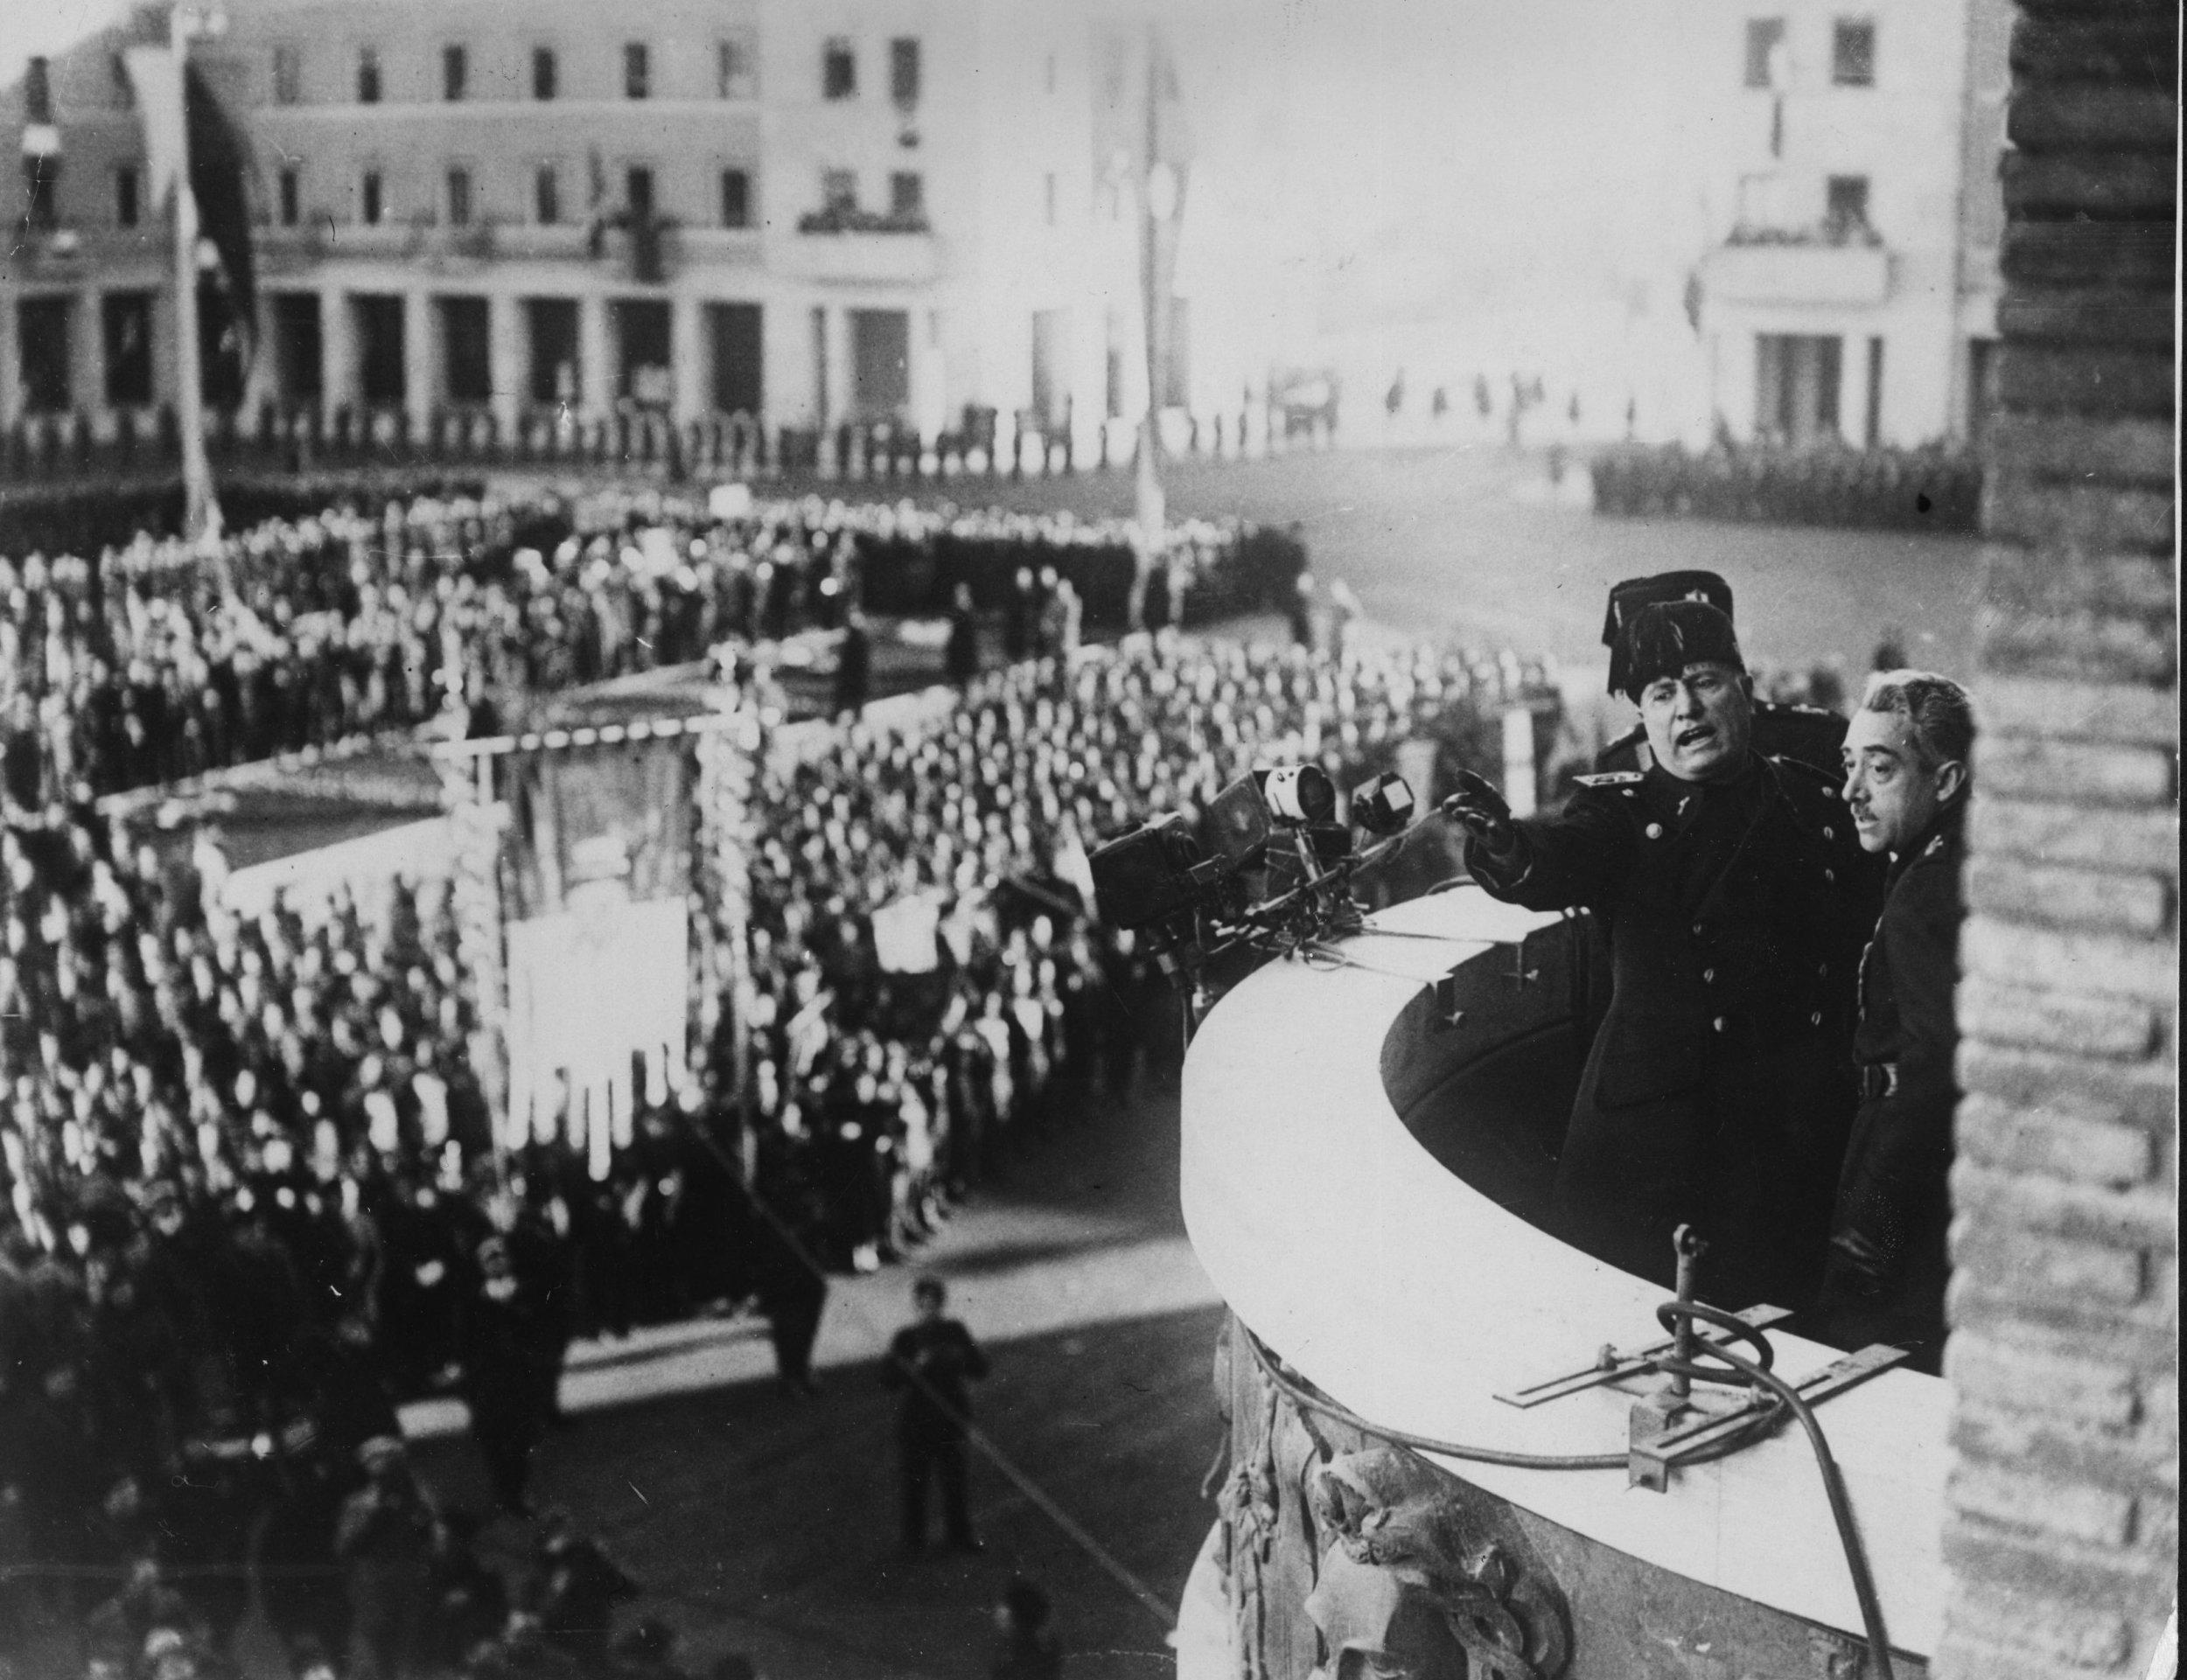 latina parco mussolini speeches - photo#48